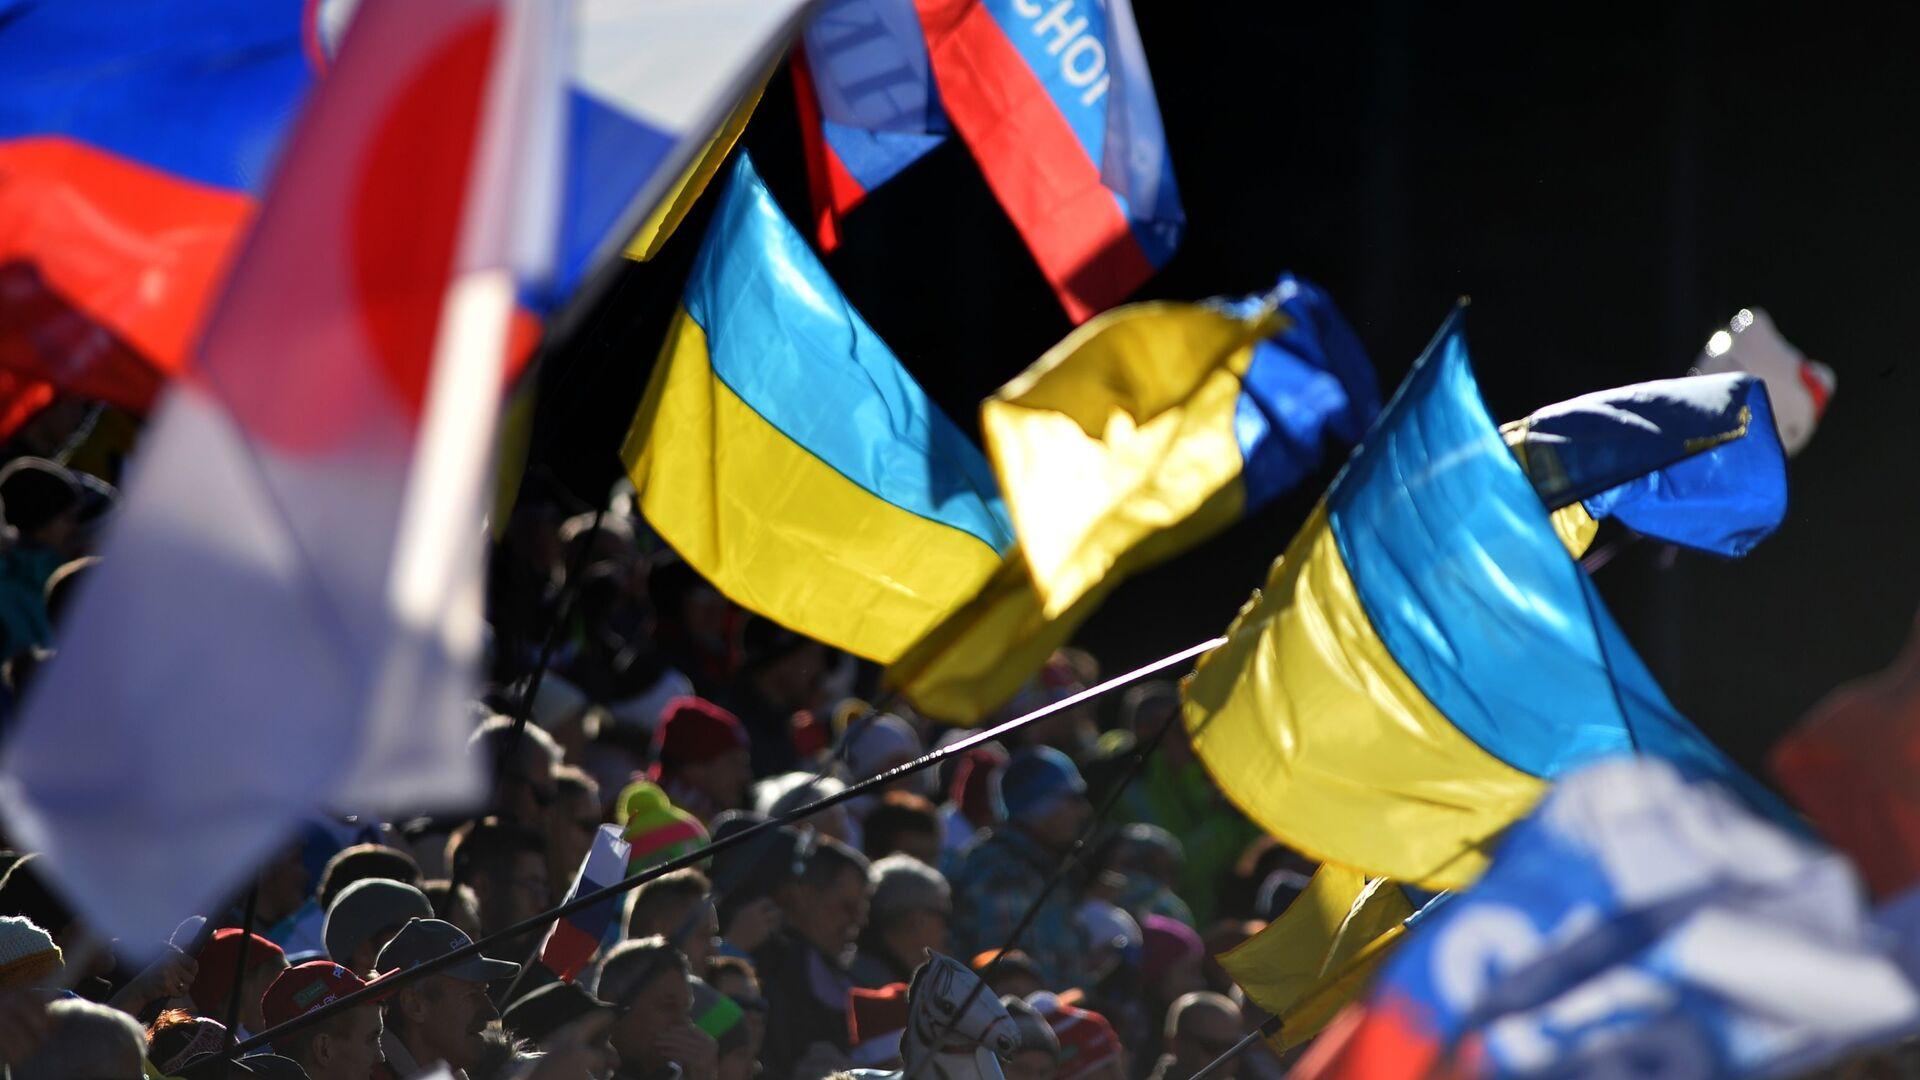 Flagi Ukrainy i Rosji - Sputnik Polska, 1920, 21.07.2021